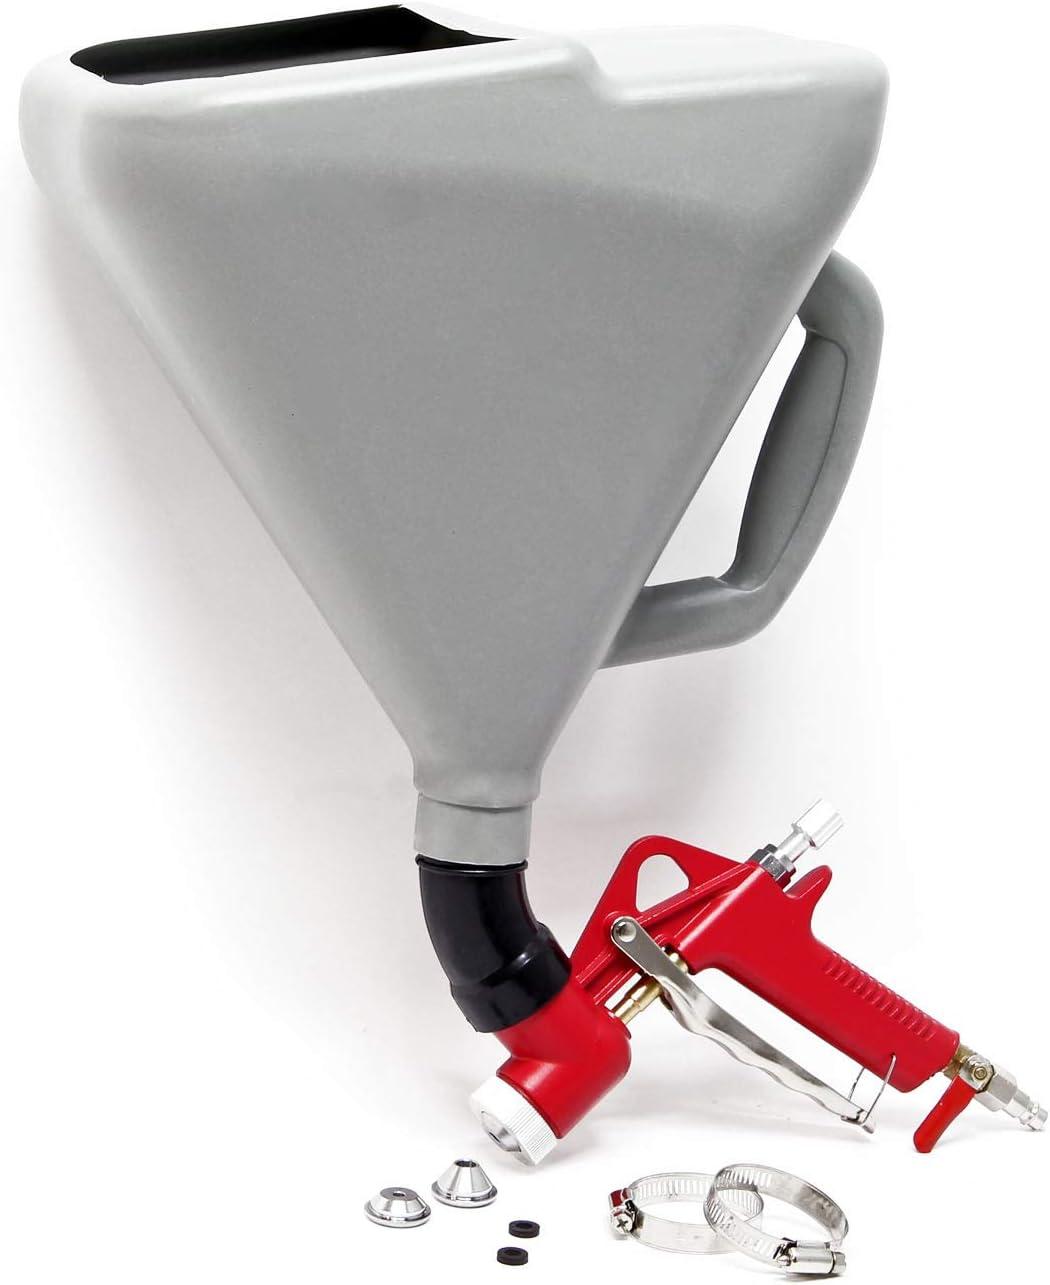 Pulverizador pintura aire comprimido Pistola pulverizar aire a presión Acople compresor Pintura Cal